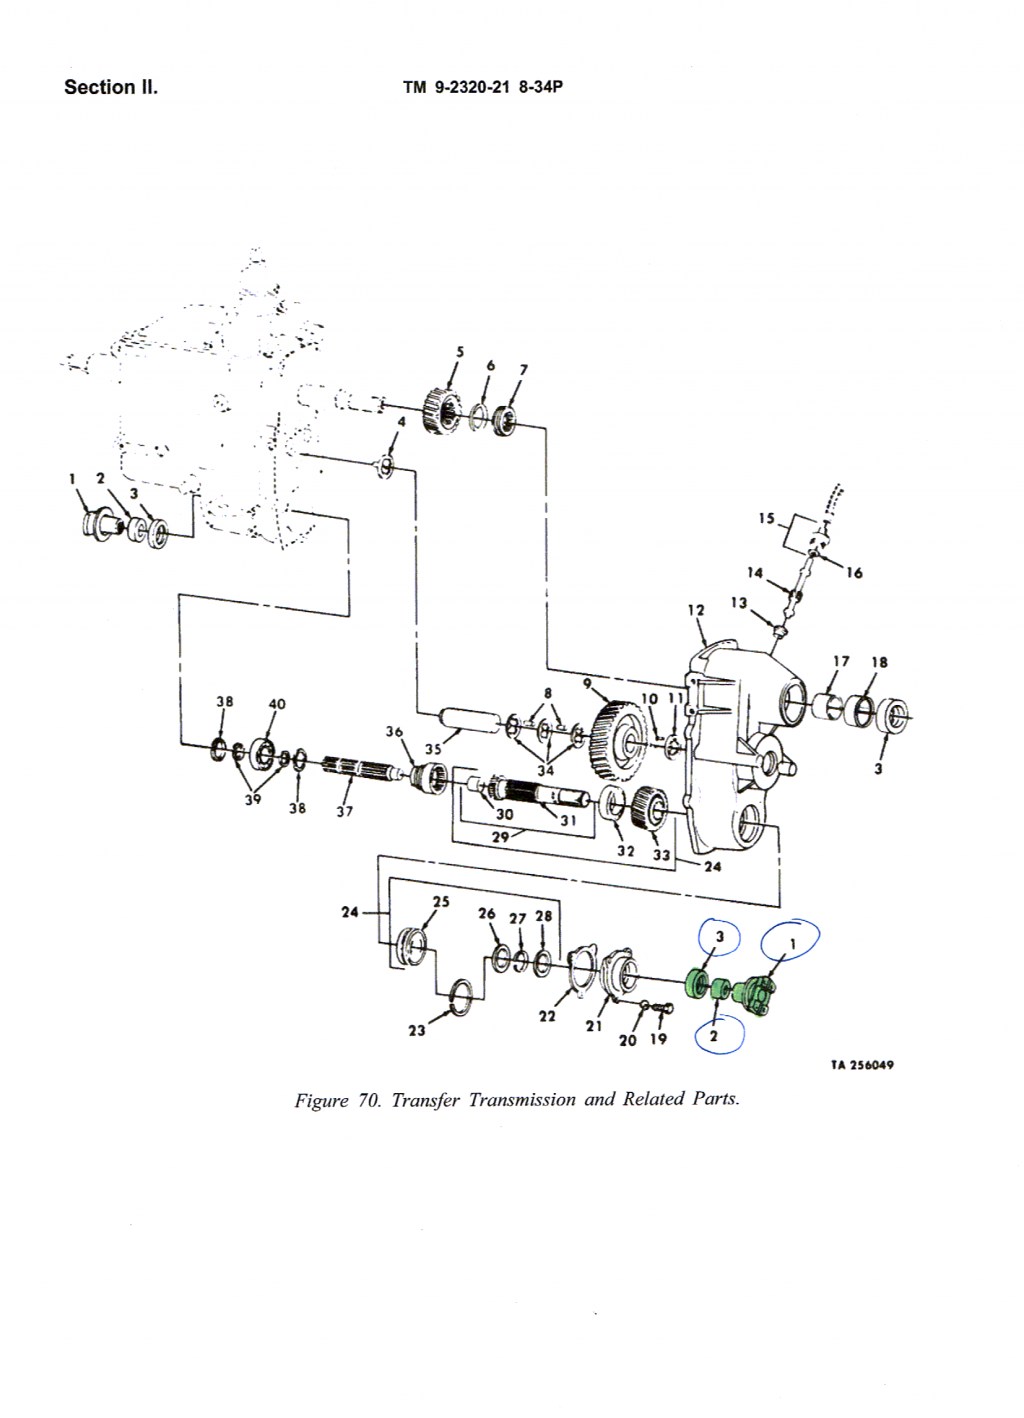 jeep wrangler jk fog light wiring diagram  jeep  auto